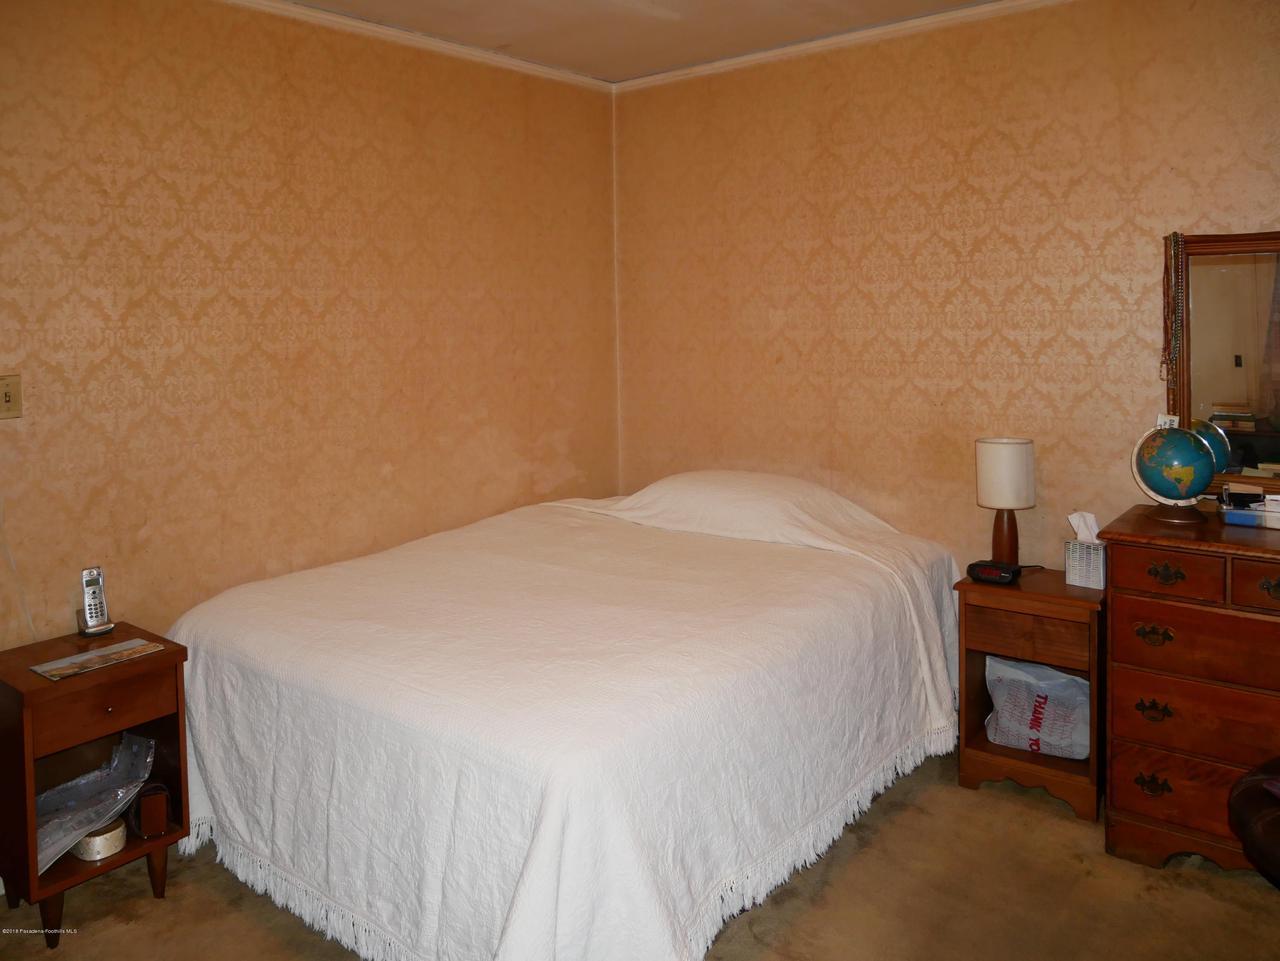 2432 ORANGE GROVE, Pasadena, CA 91104 - Second Bedroom 1